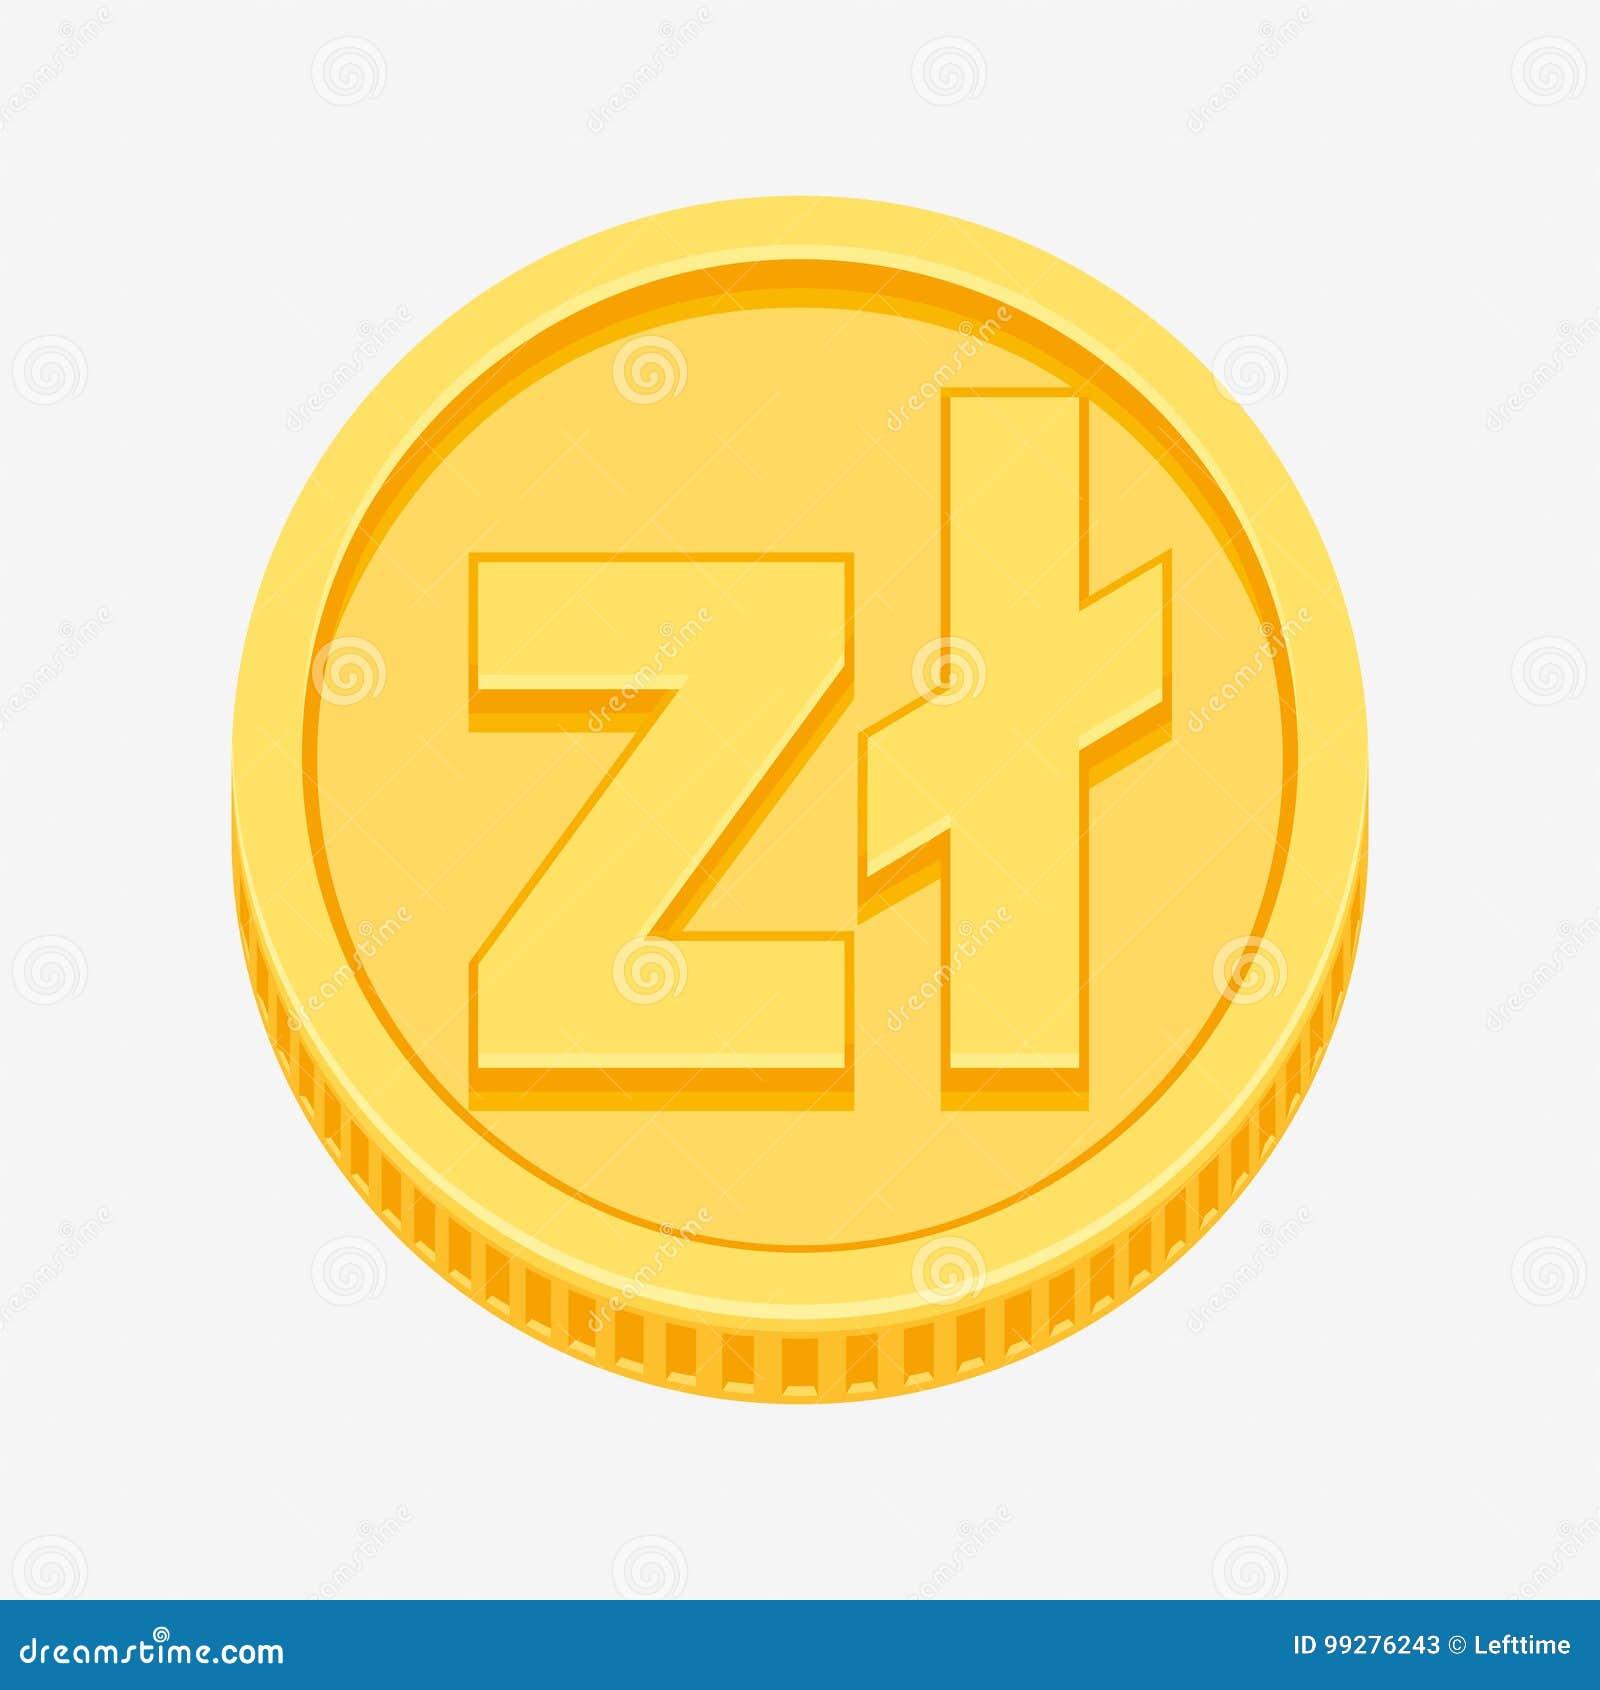 Polish Zloty Symbol On Gold Coin Stock Vector Illustration Of